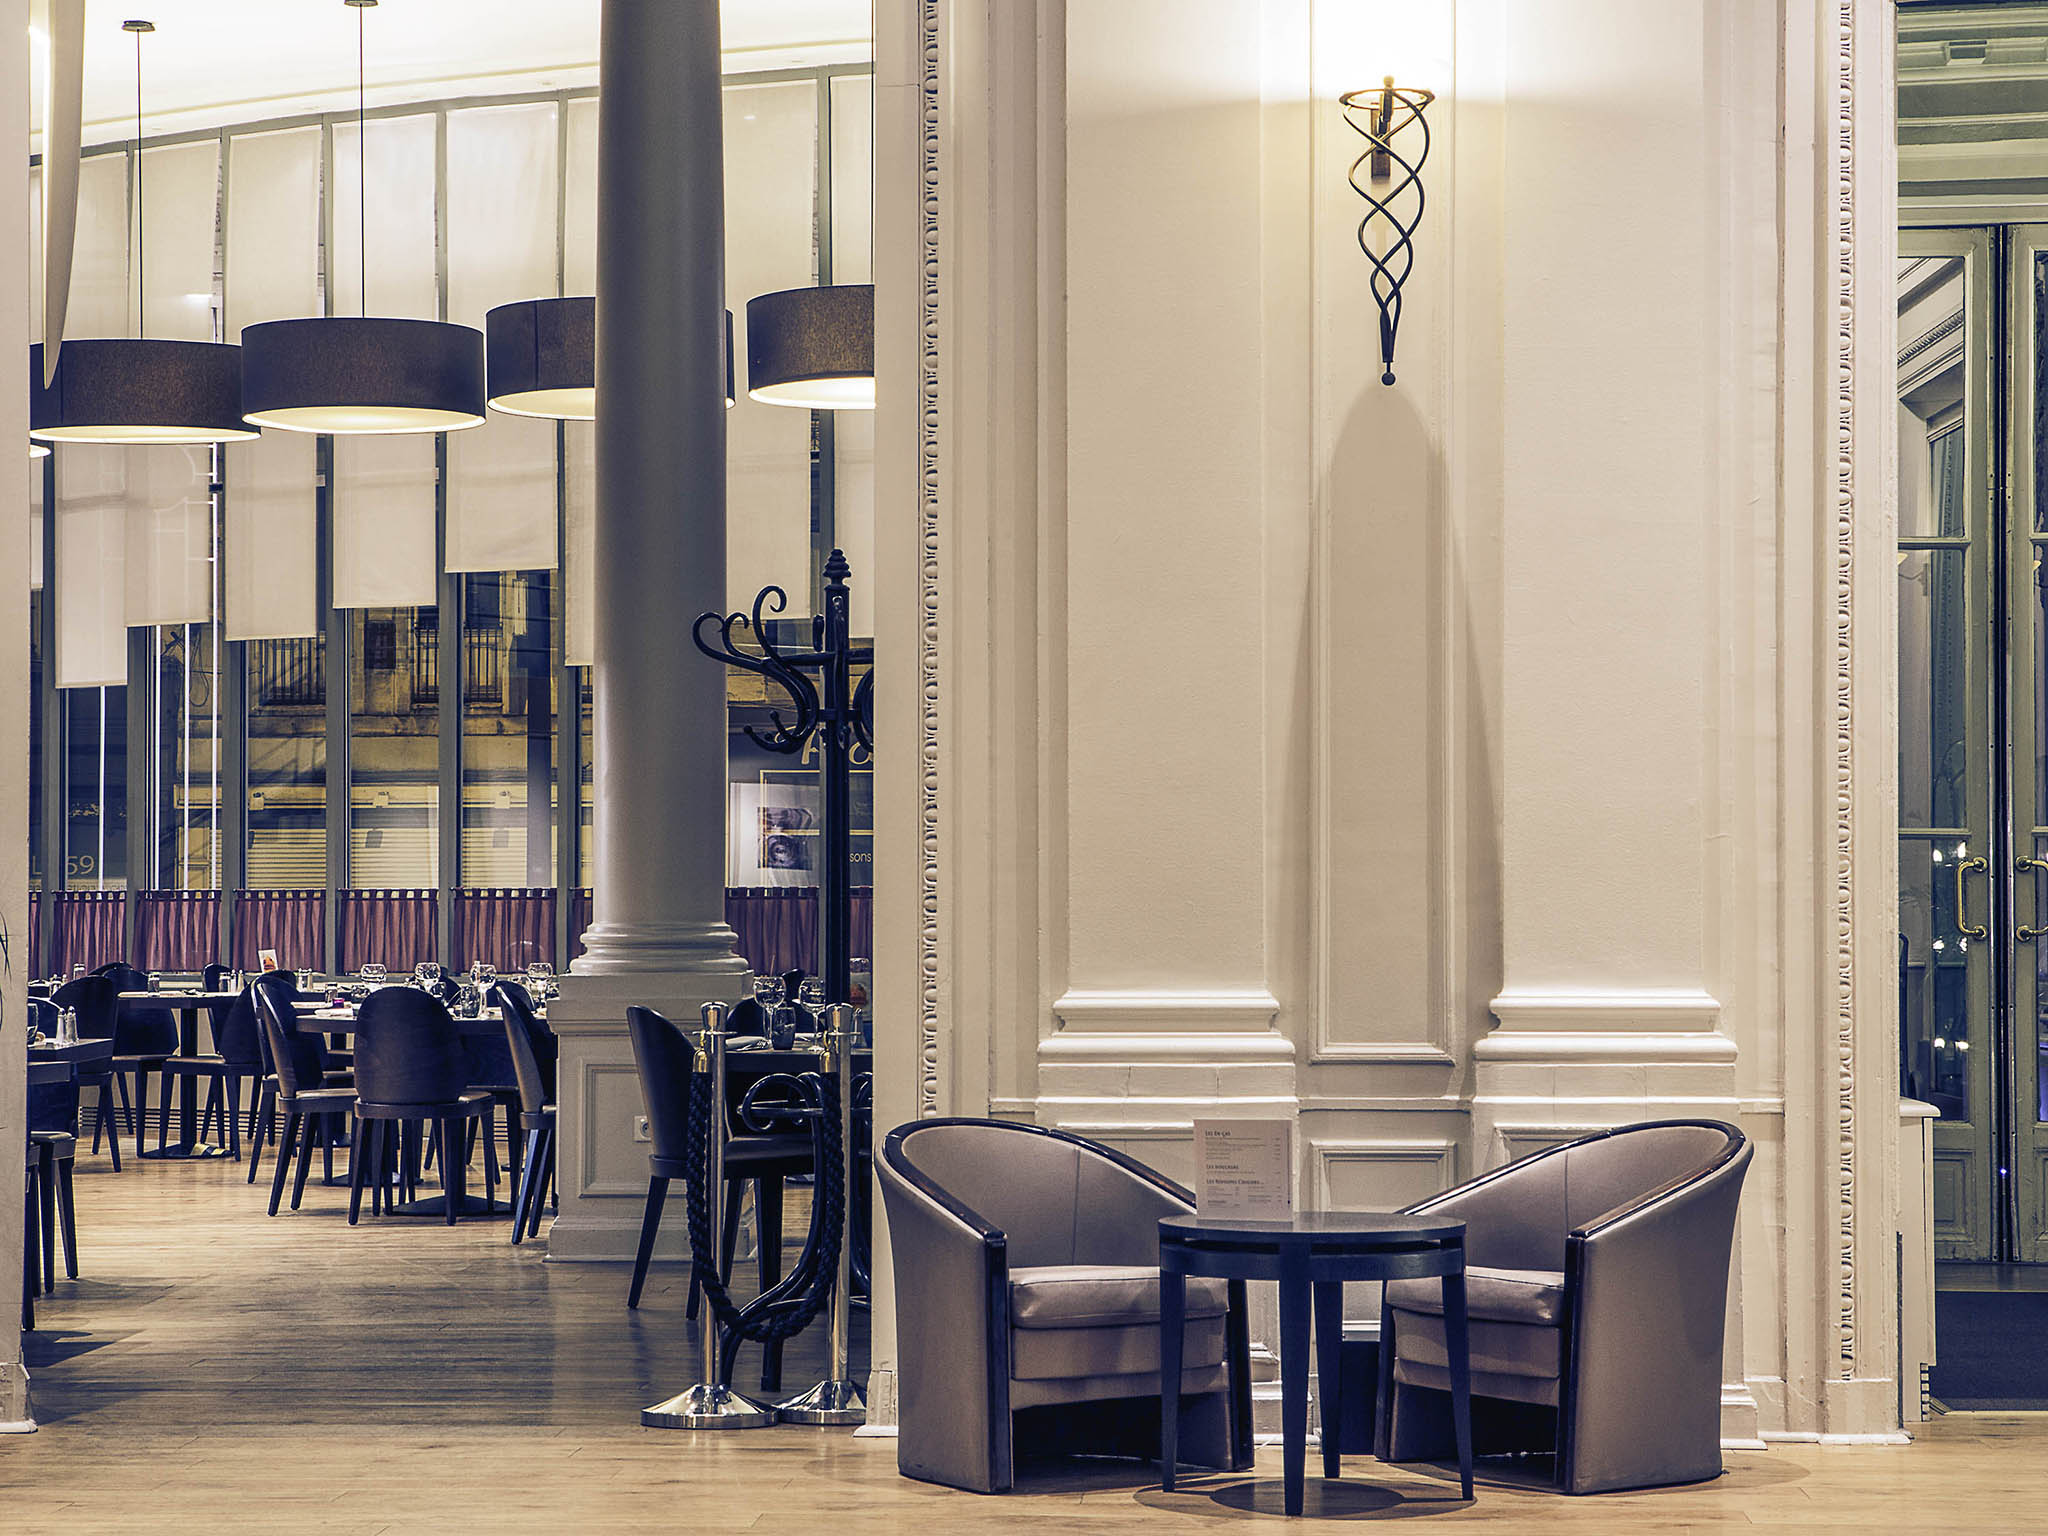 Отель — Hôtel Mercure Lille Roubaix Grand Hôtel